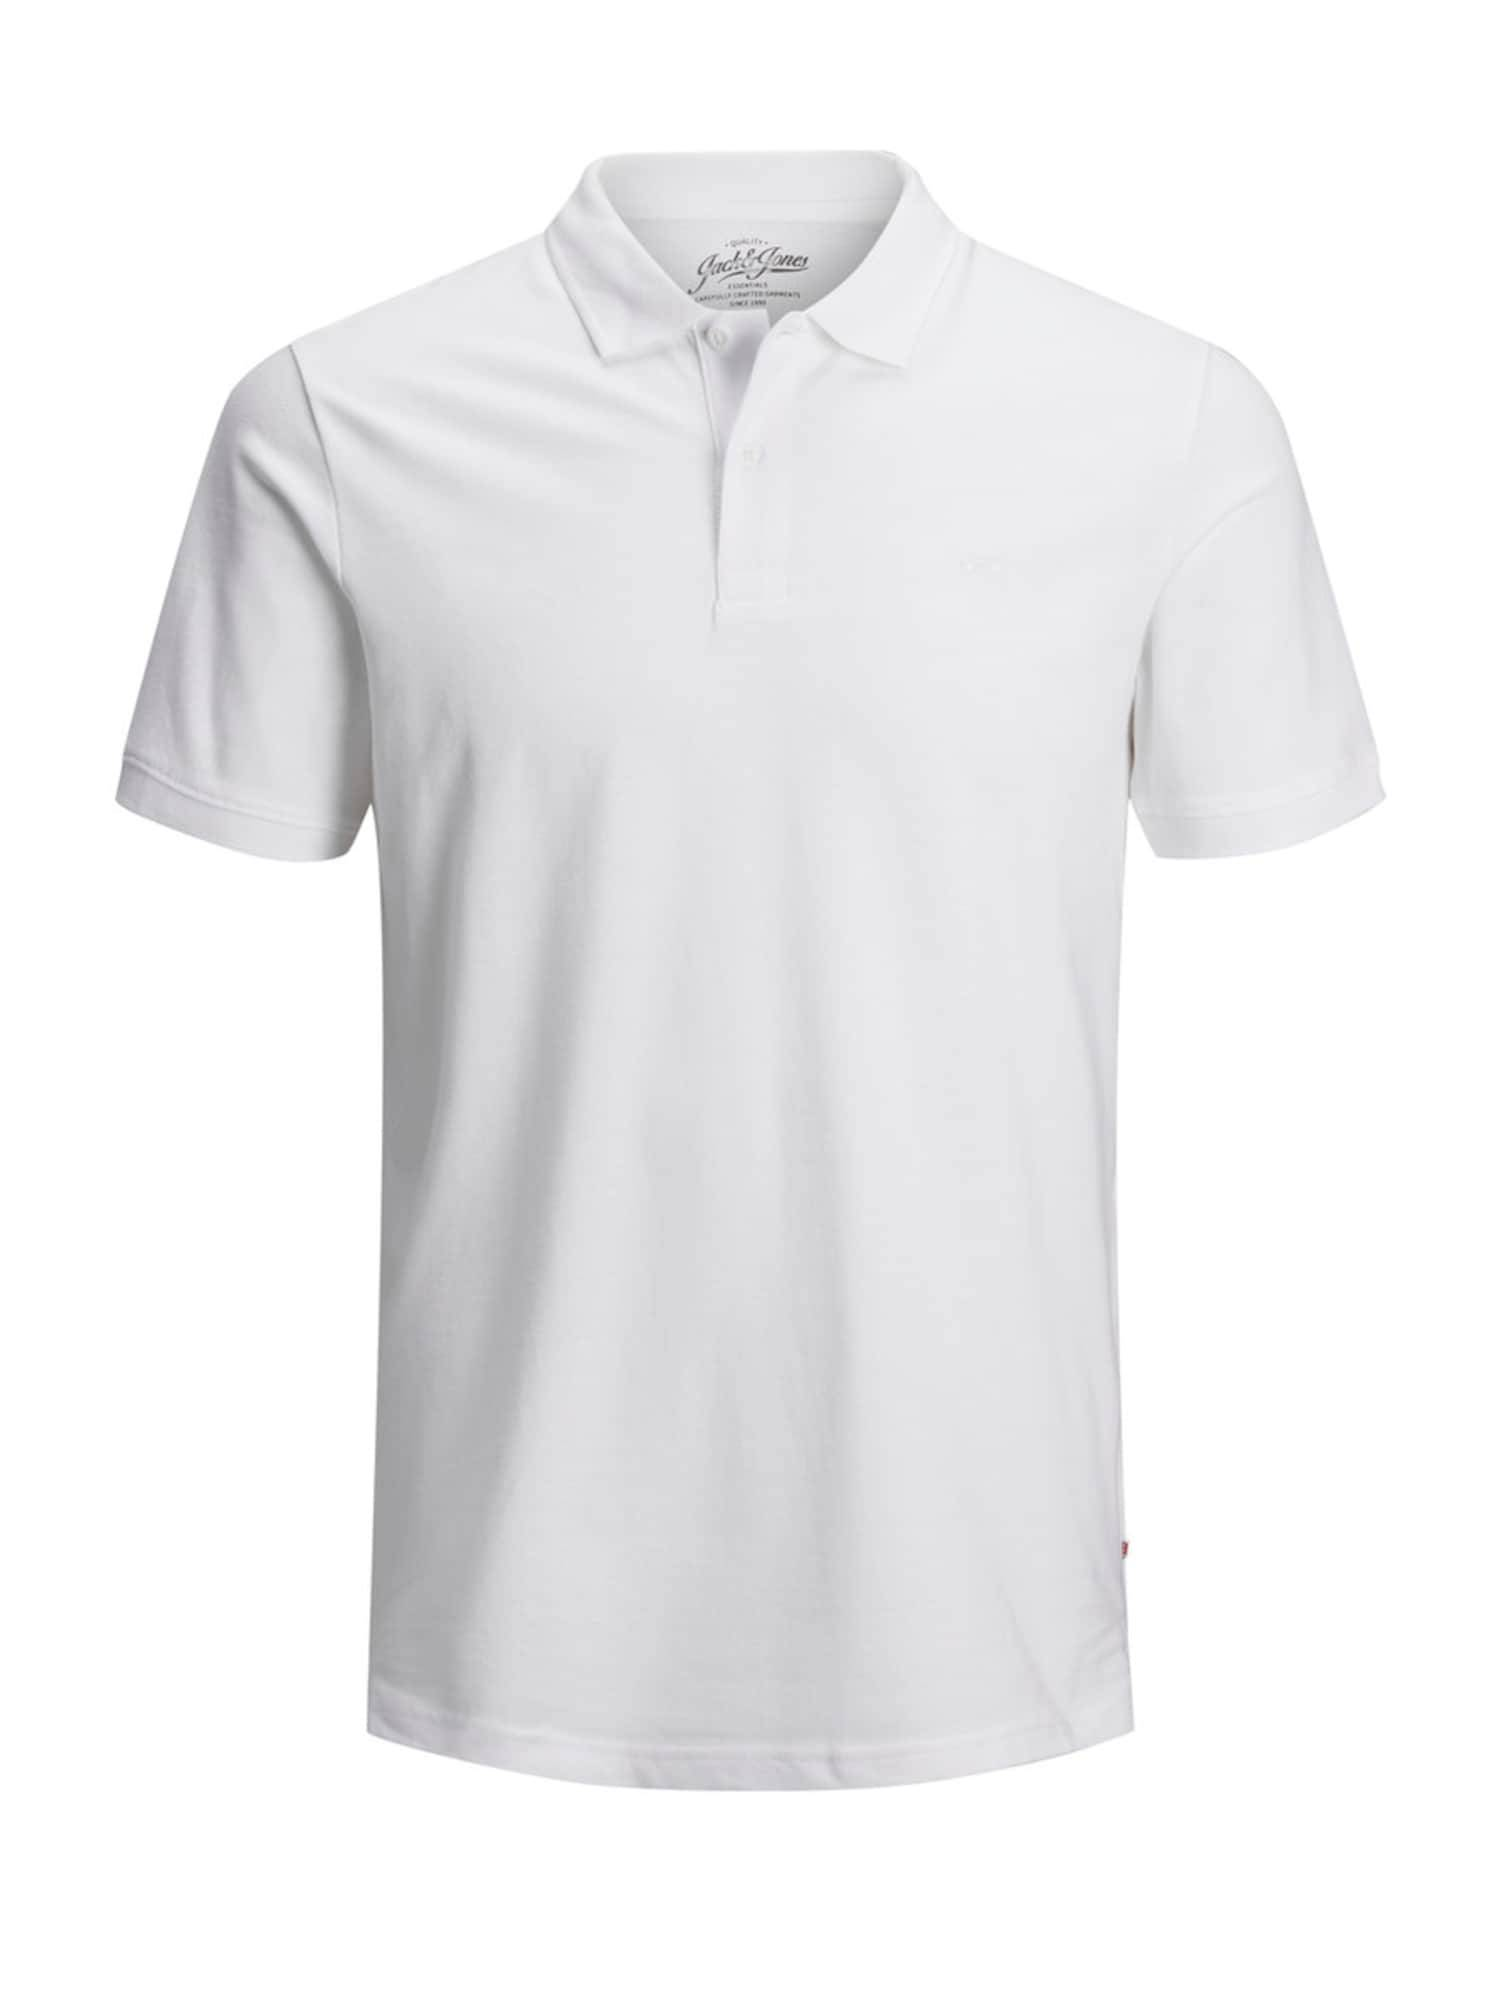 JACK & JONES T-Shirt  - Blanc - Taille: M - male